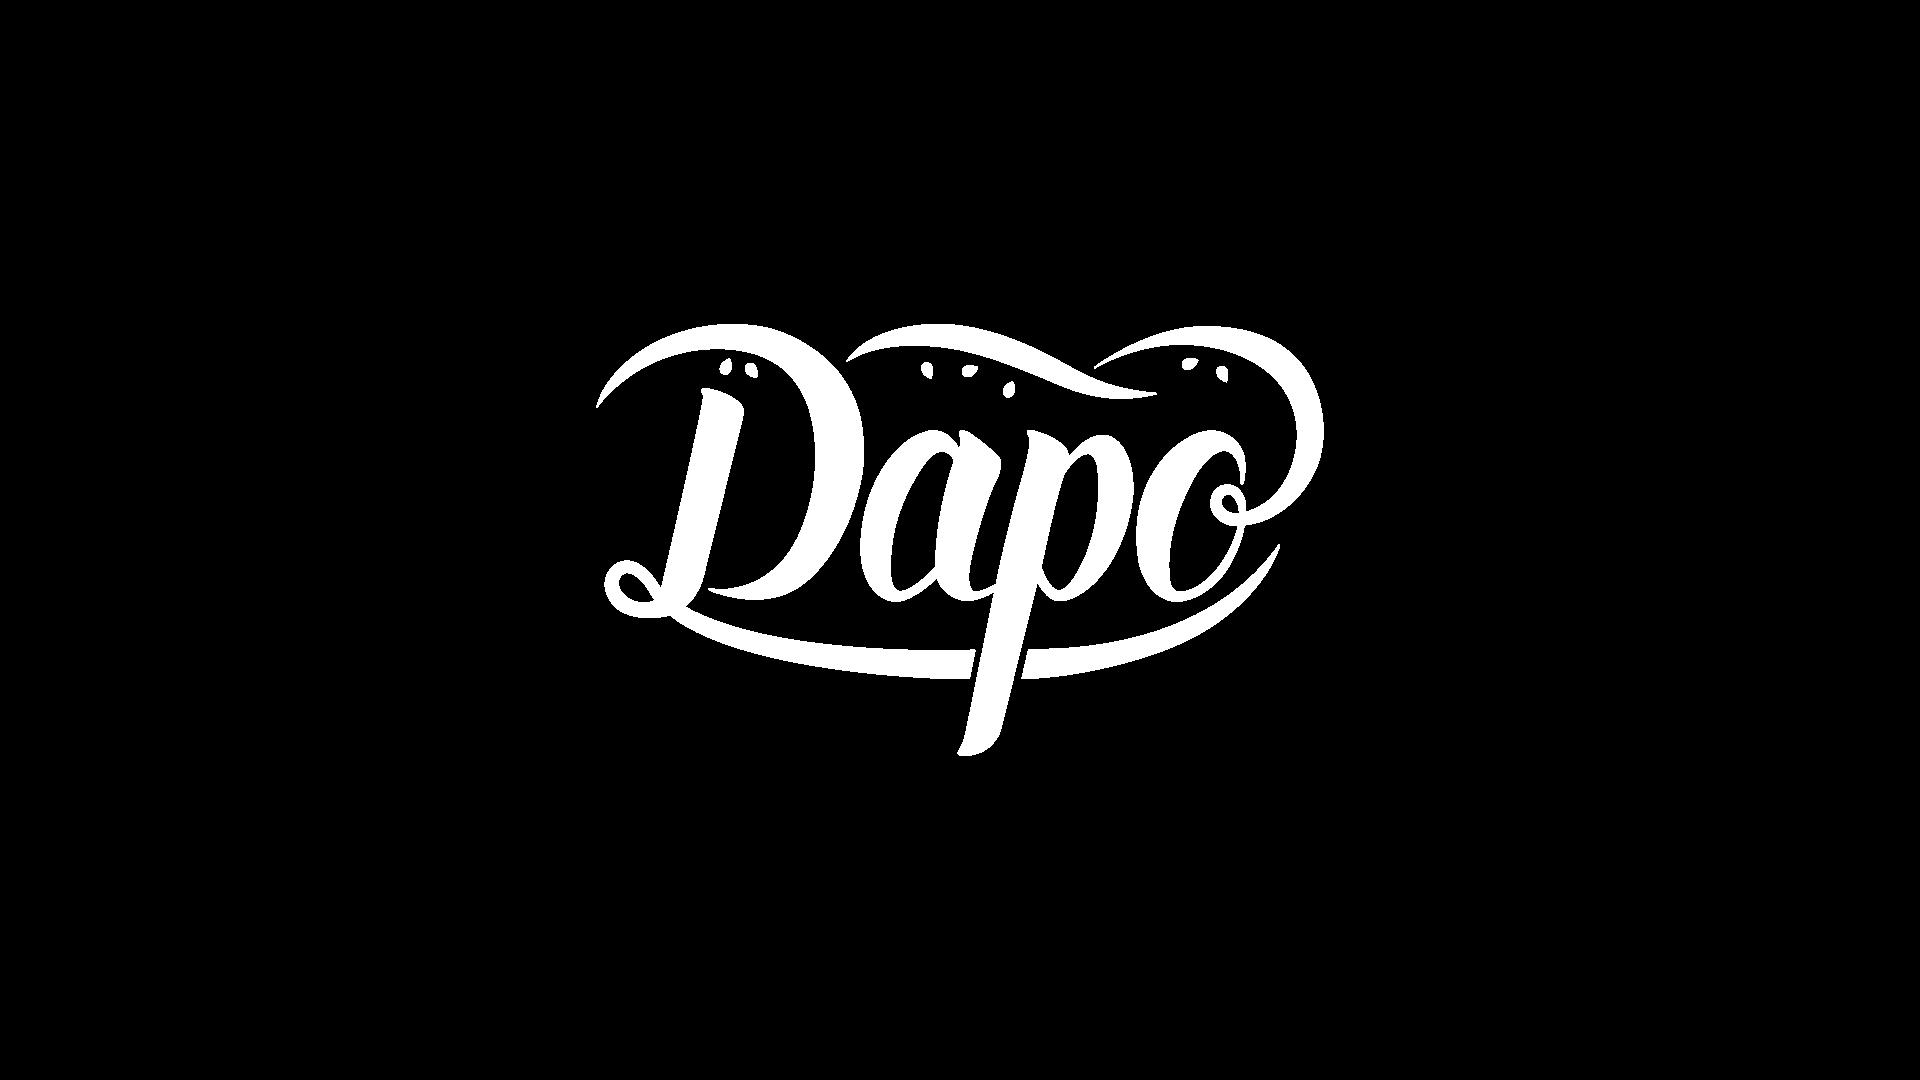 daro-01a